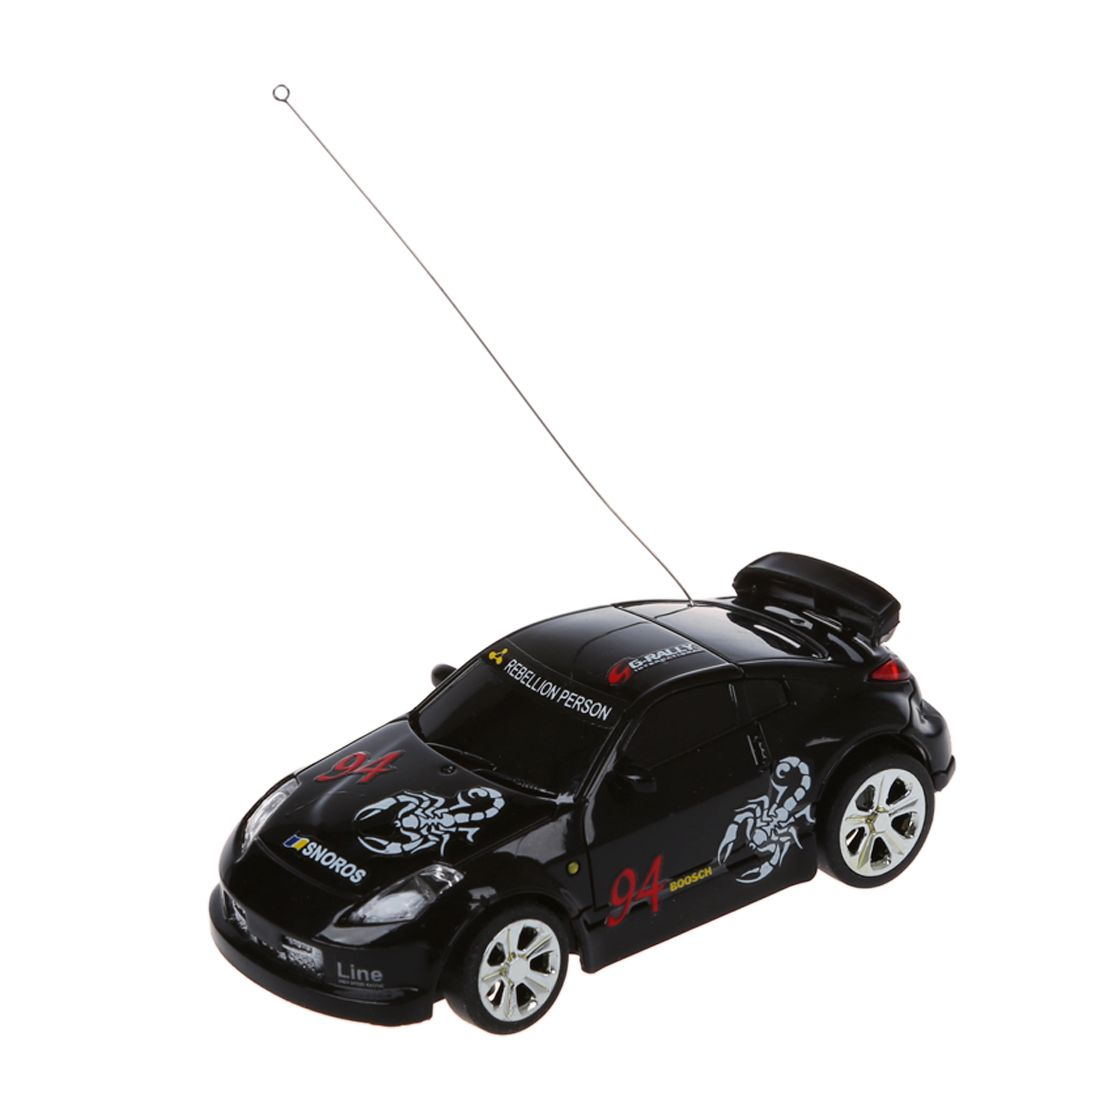 Getrouw Mini Rc Remote Controlled Auto Racing Car Speelgoed In De Drank Kan 1:58 (zwart) Nieuwe